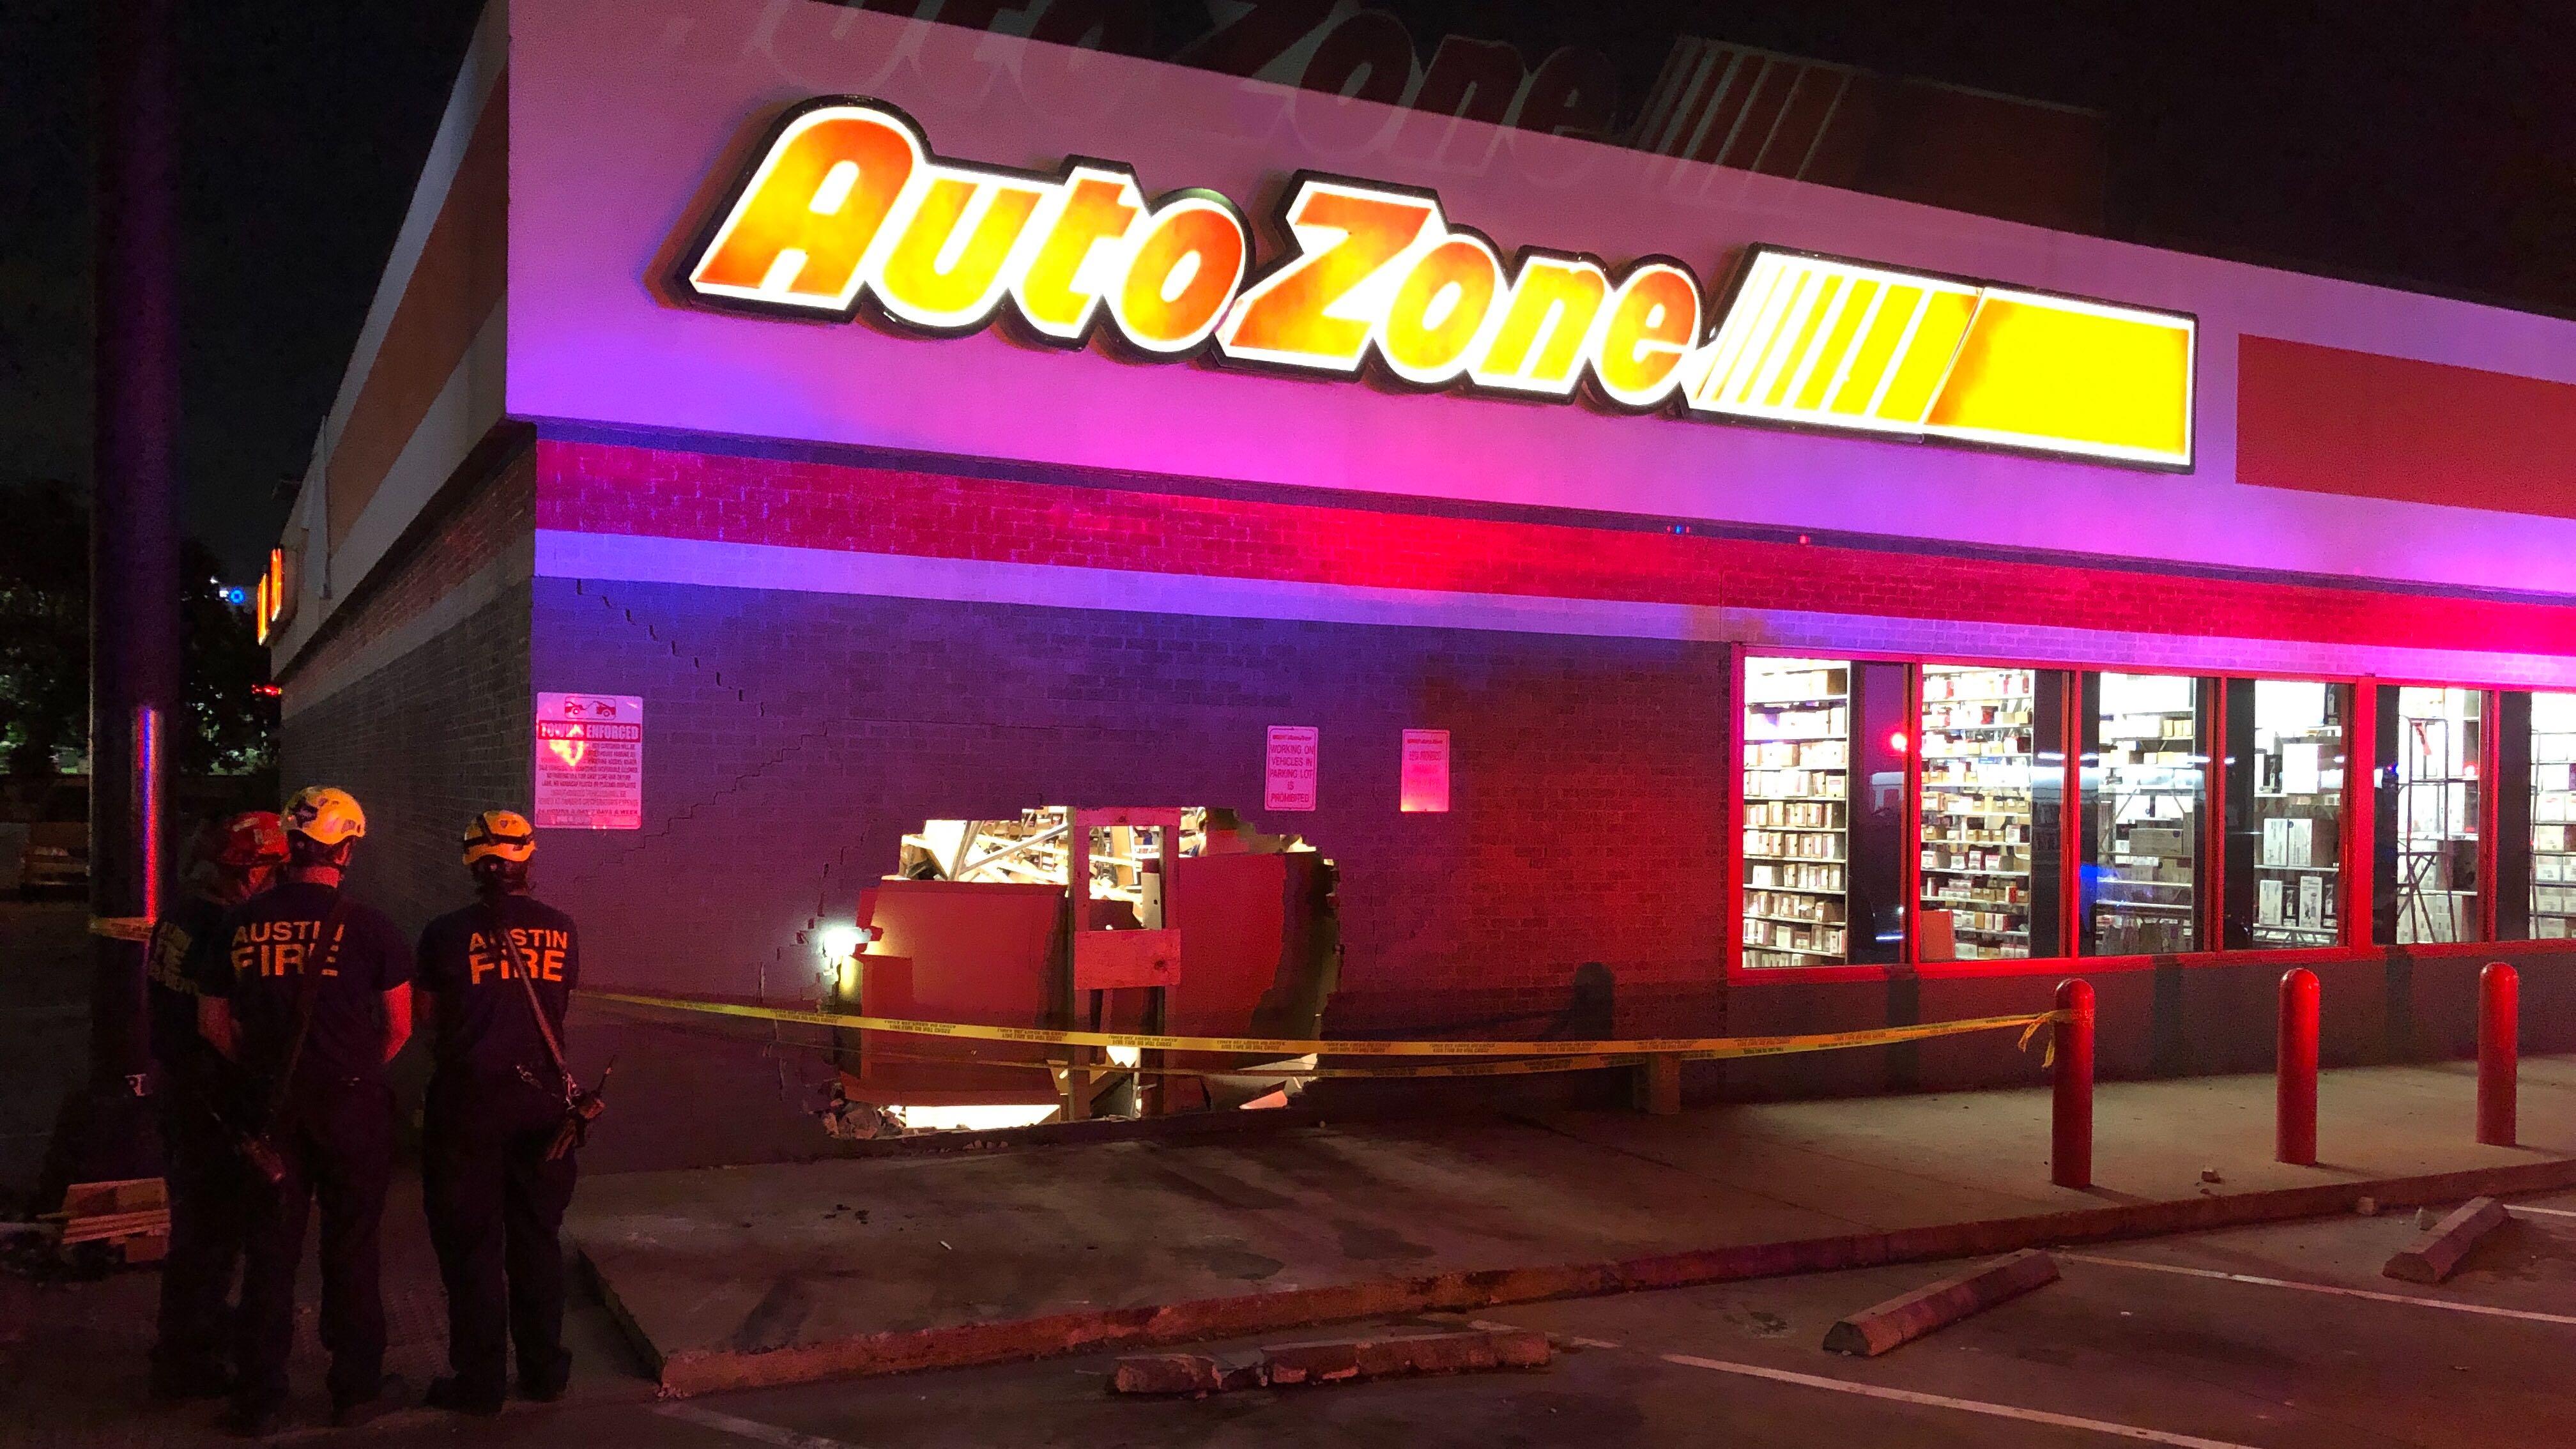 Car crashes into AutoZone in east Austin Monday